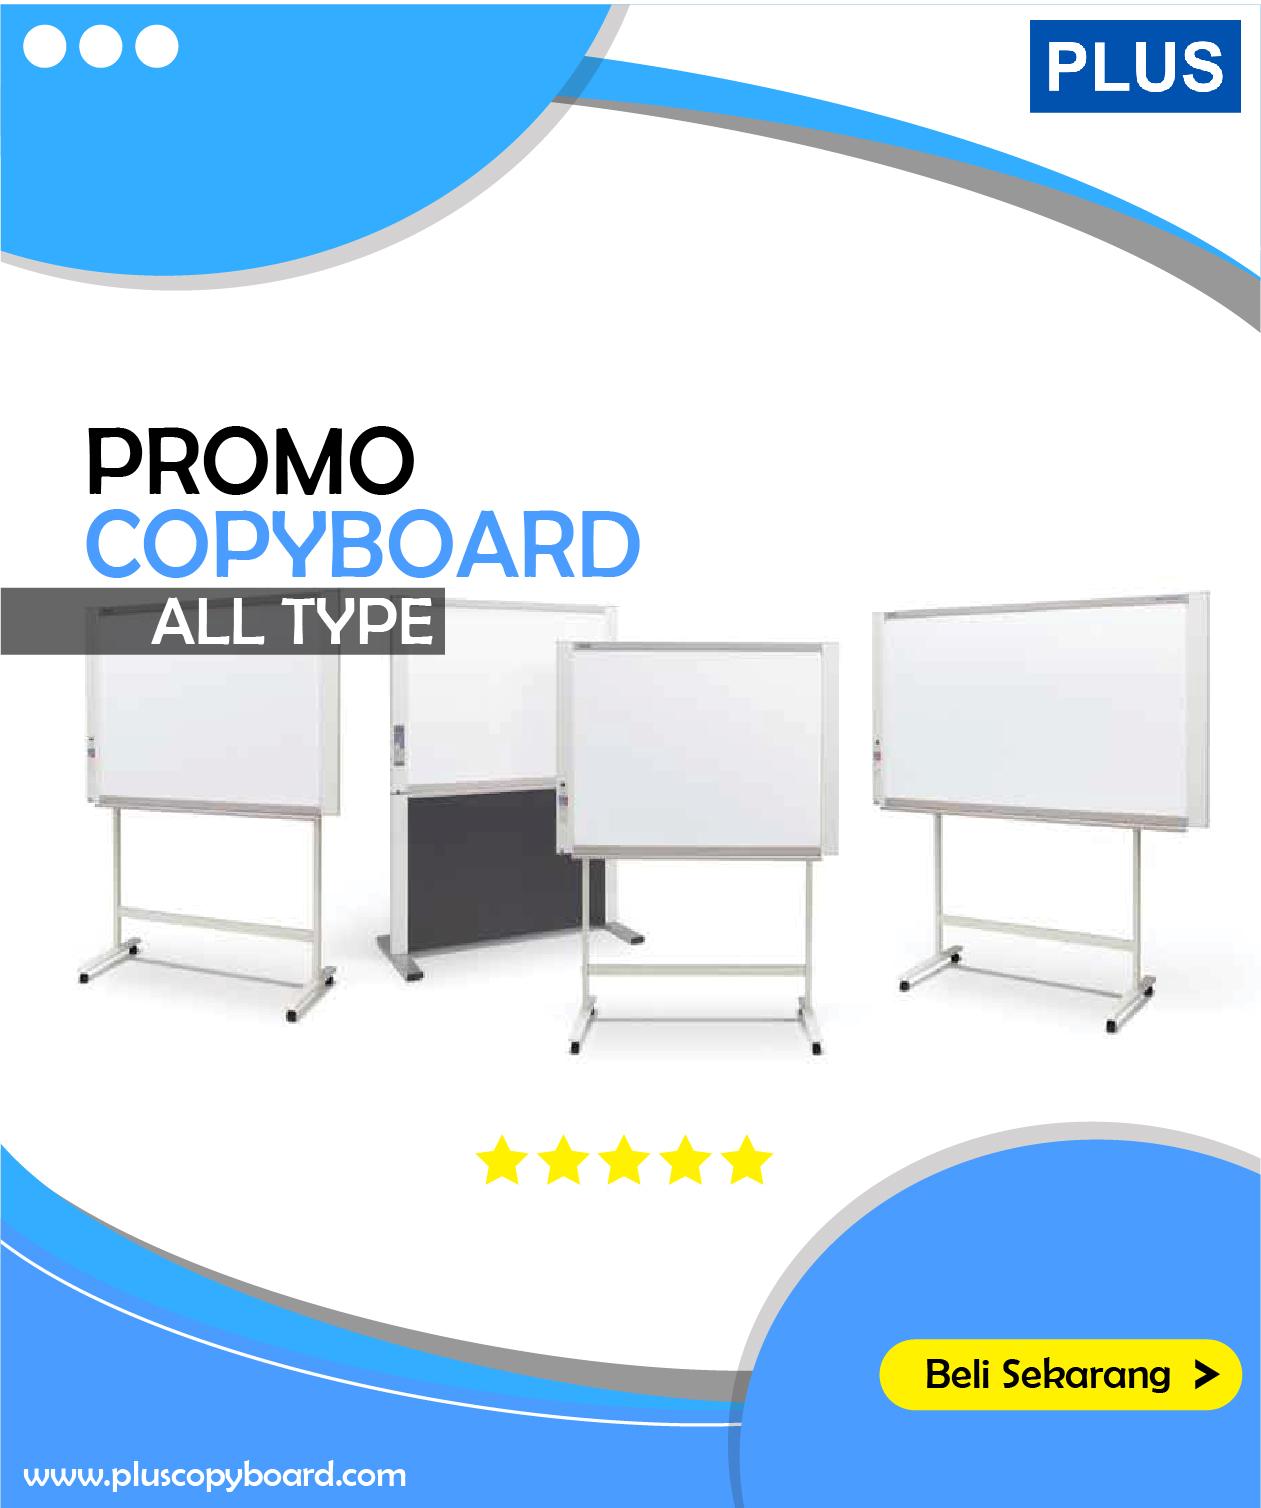 promo copyboard